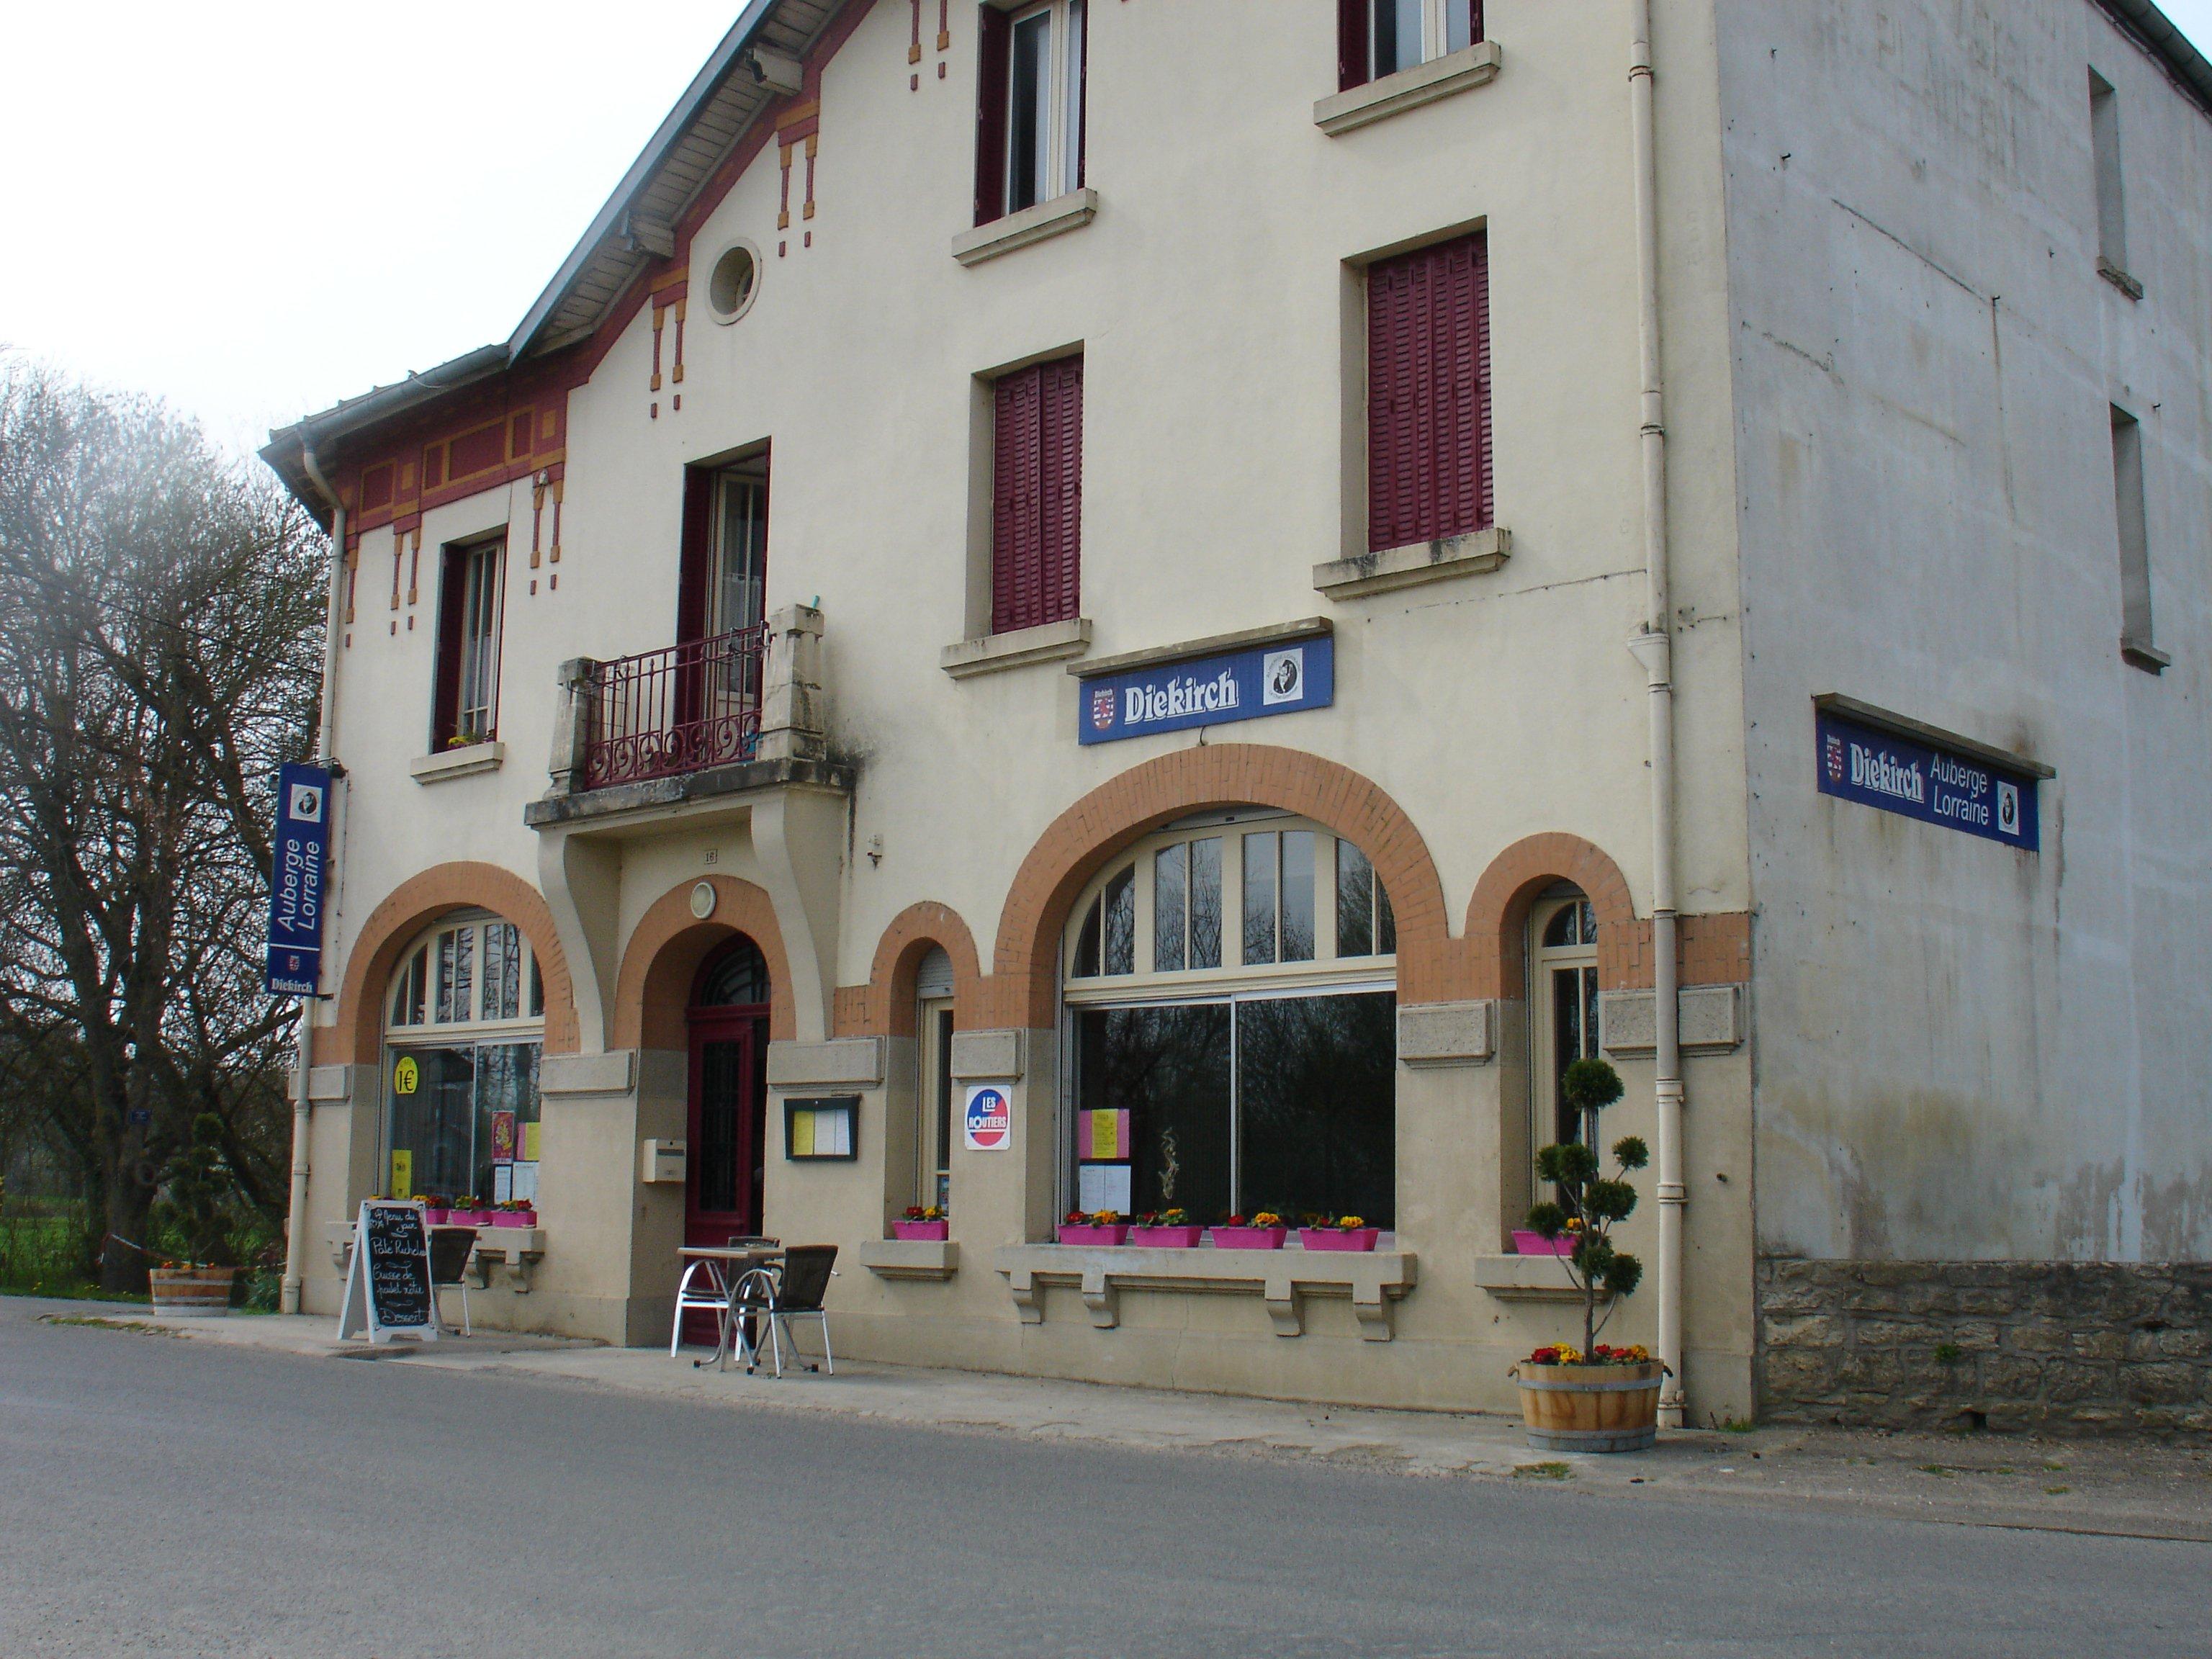 Bar auberge lorraine restaurant fait maison consenvoye for Maison du luxembourg restaurant